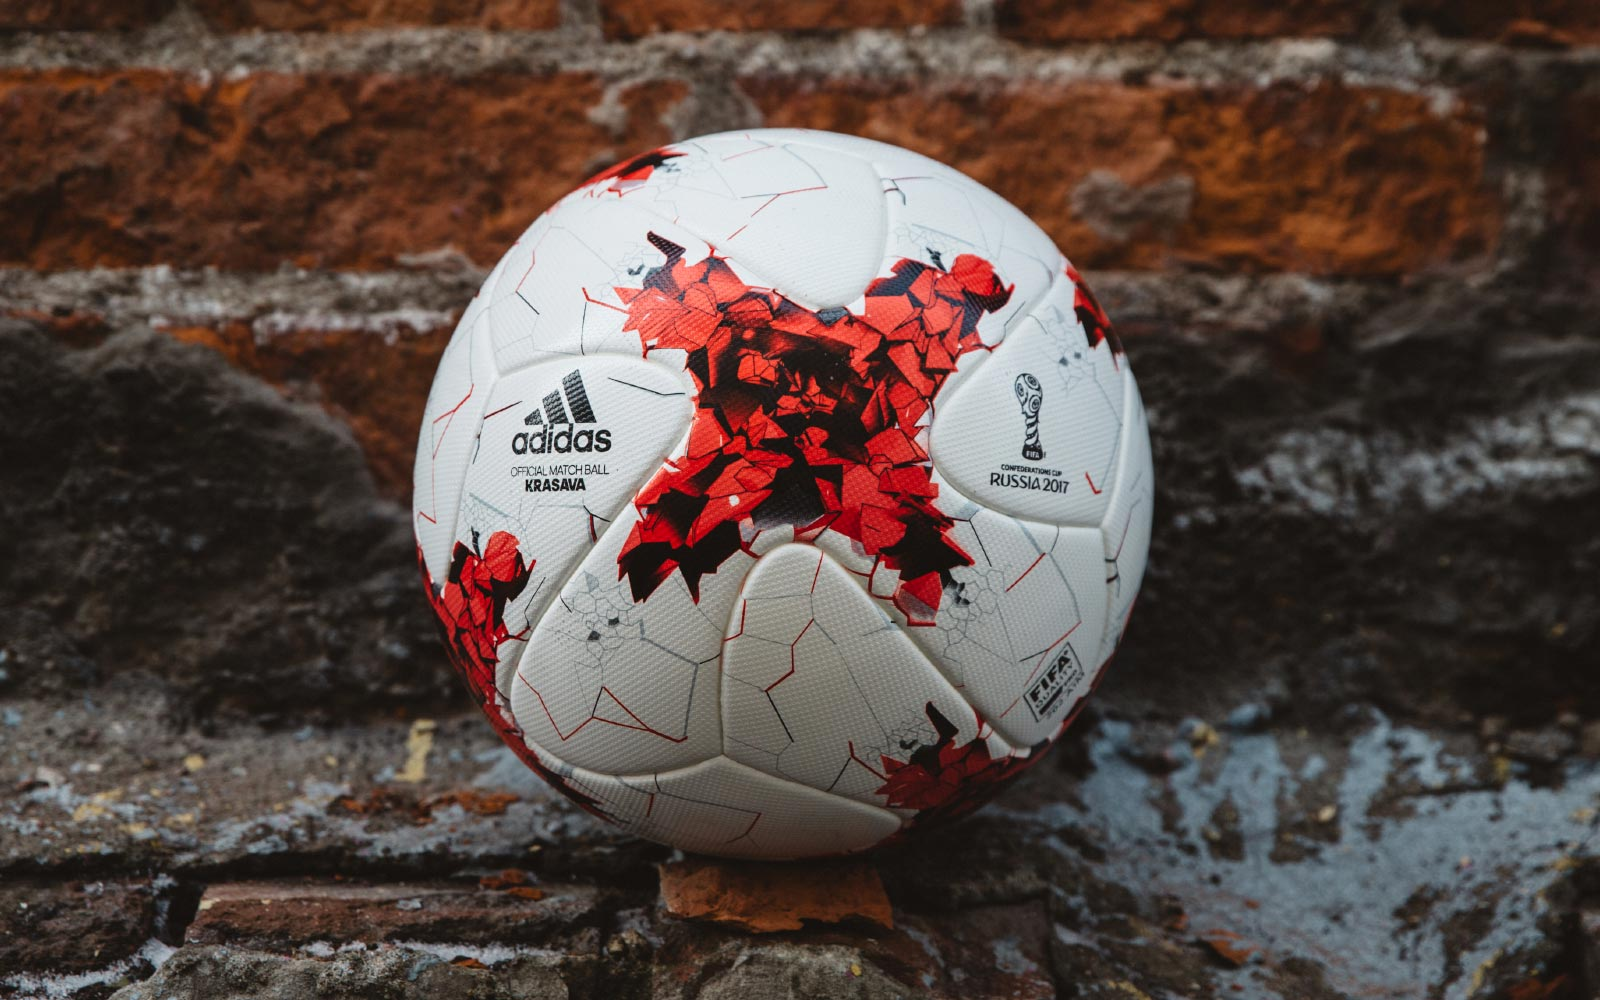 Adidas Krasava 2017 Confed Cup Ball Released - Footy Headlines